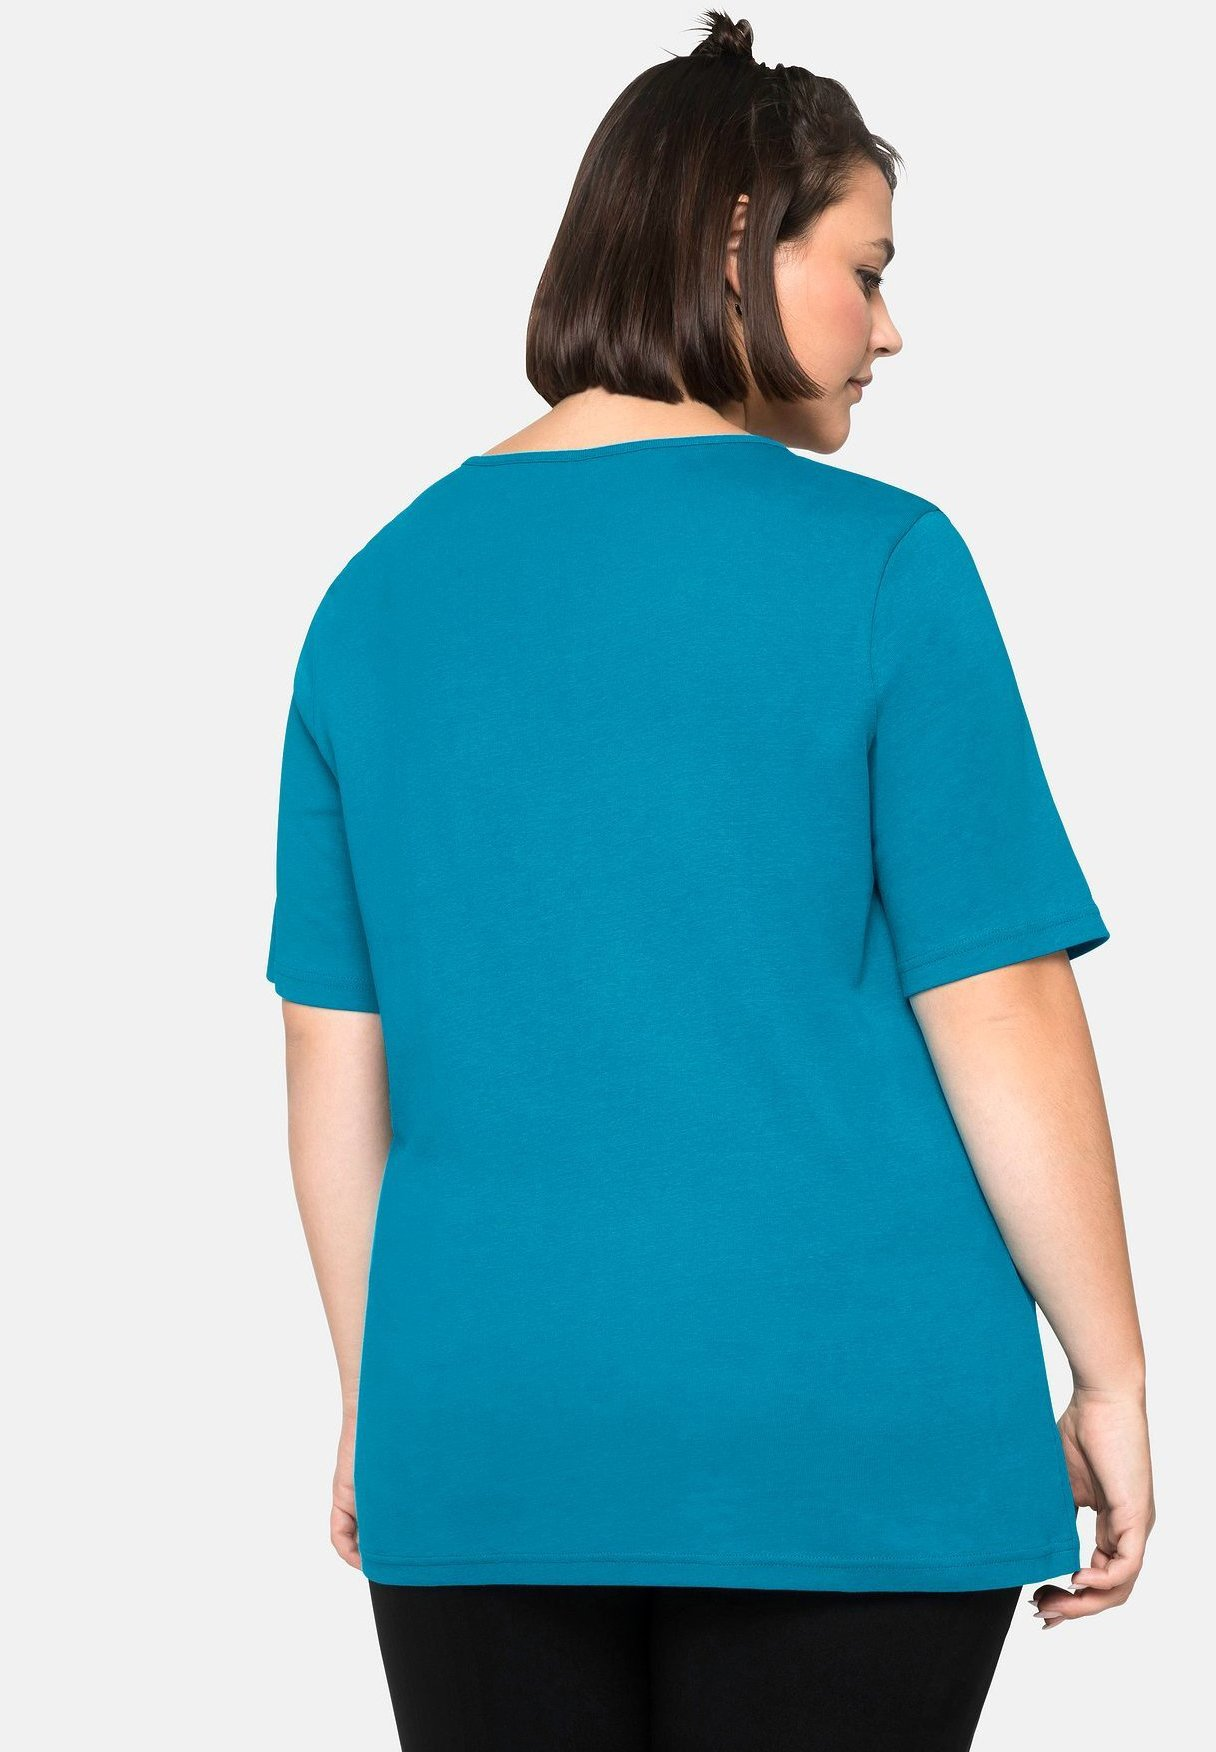 Sheego Print T-shirt - Turquoise